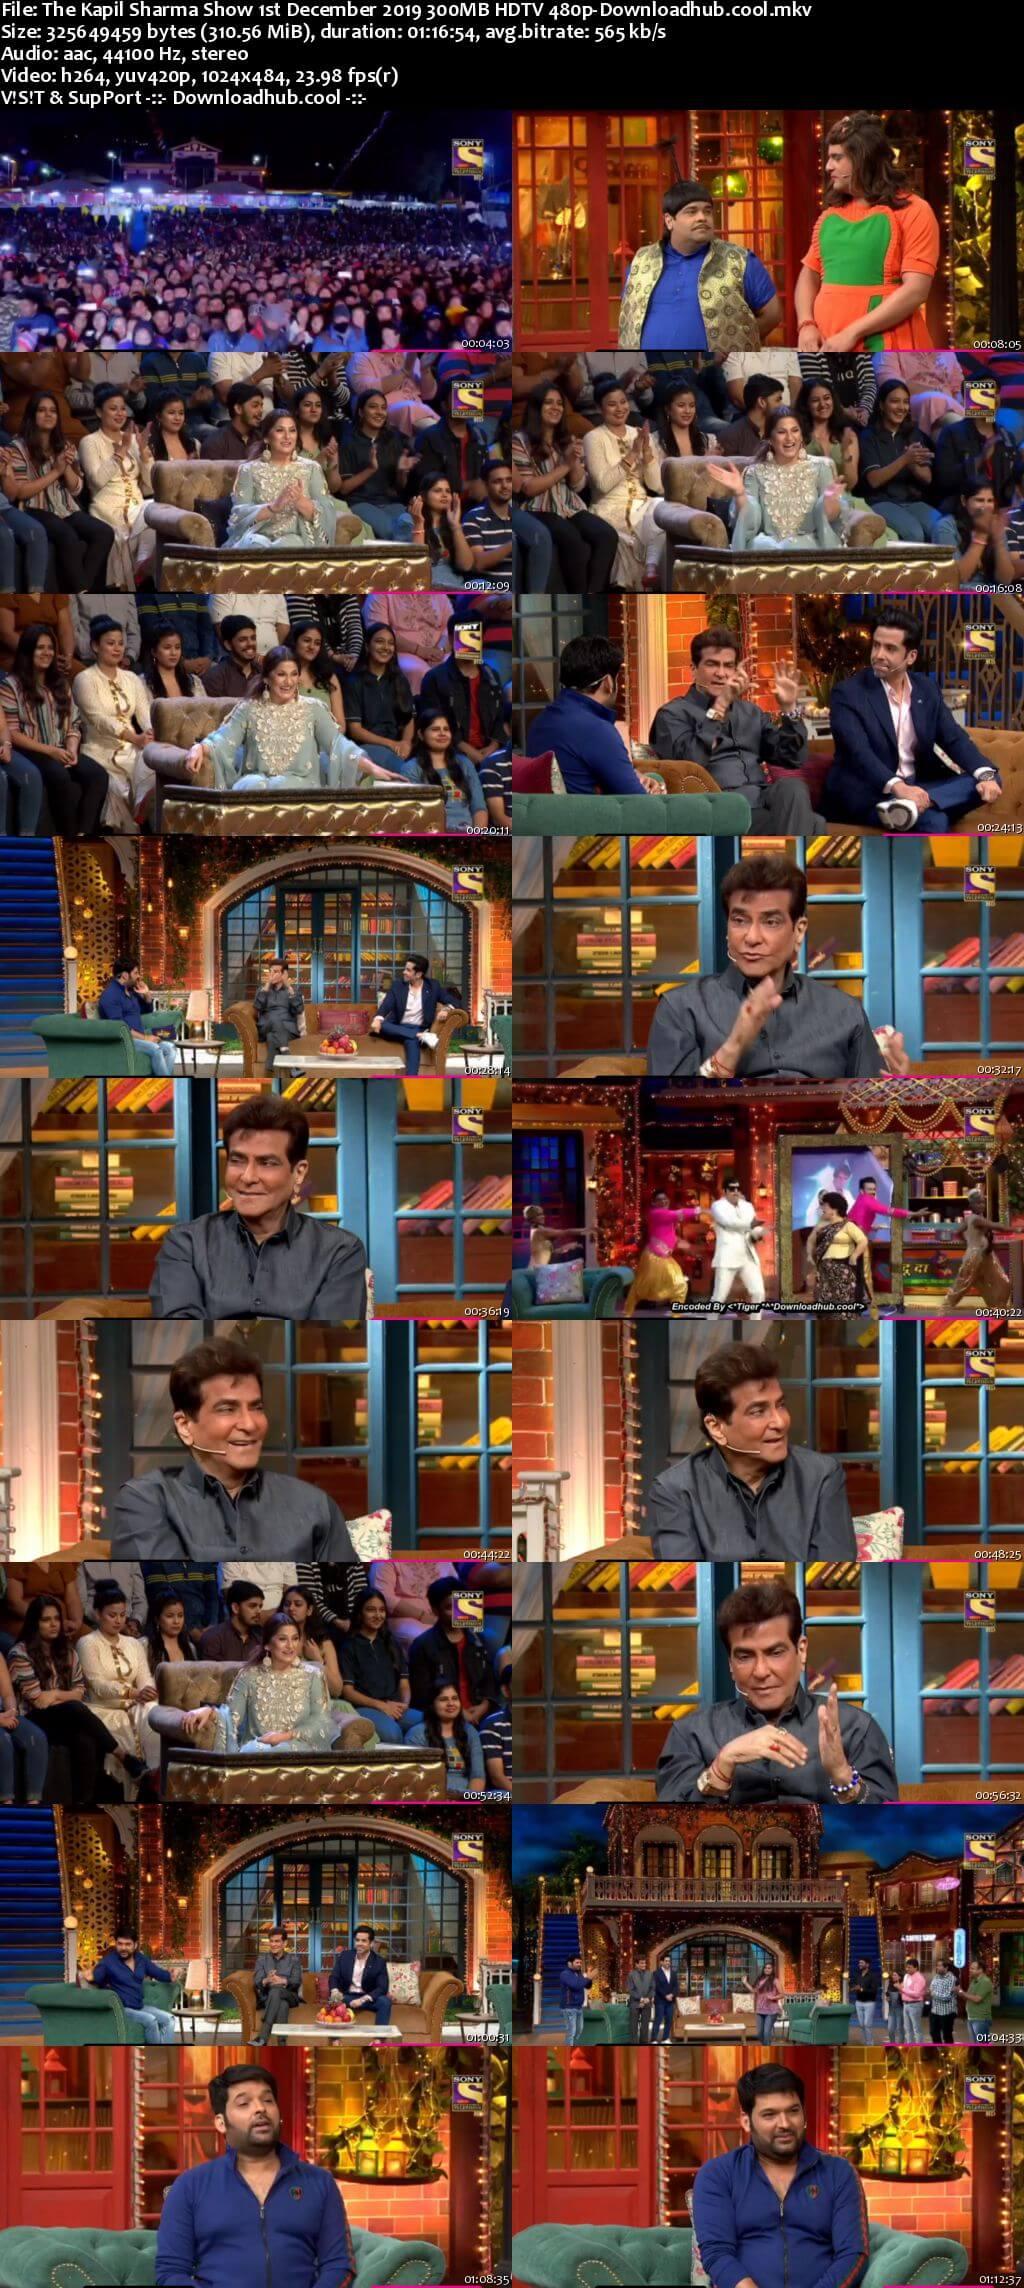 The Kapil Sharma Show 01 December 2019 Episode 96 HDTV 480p